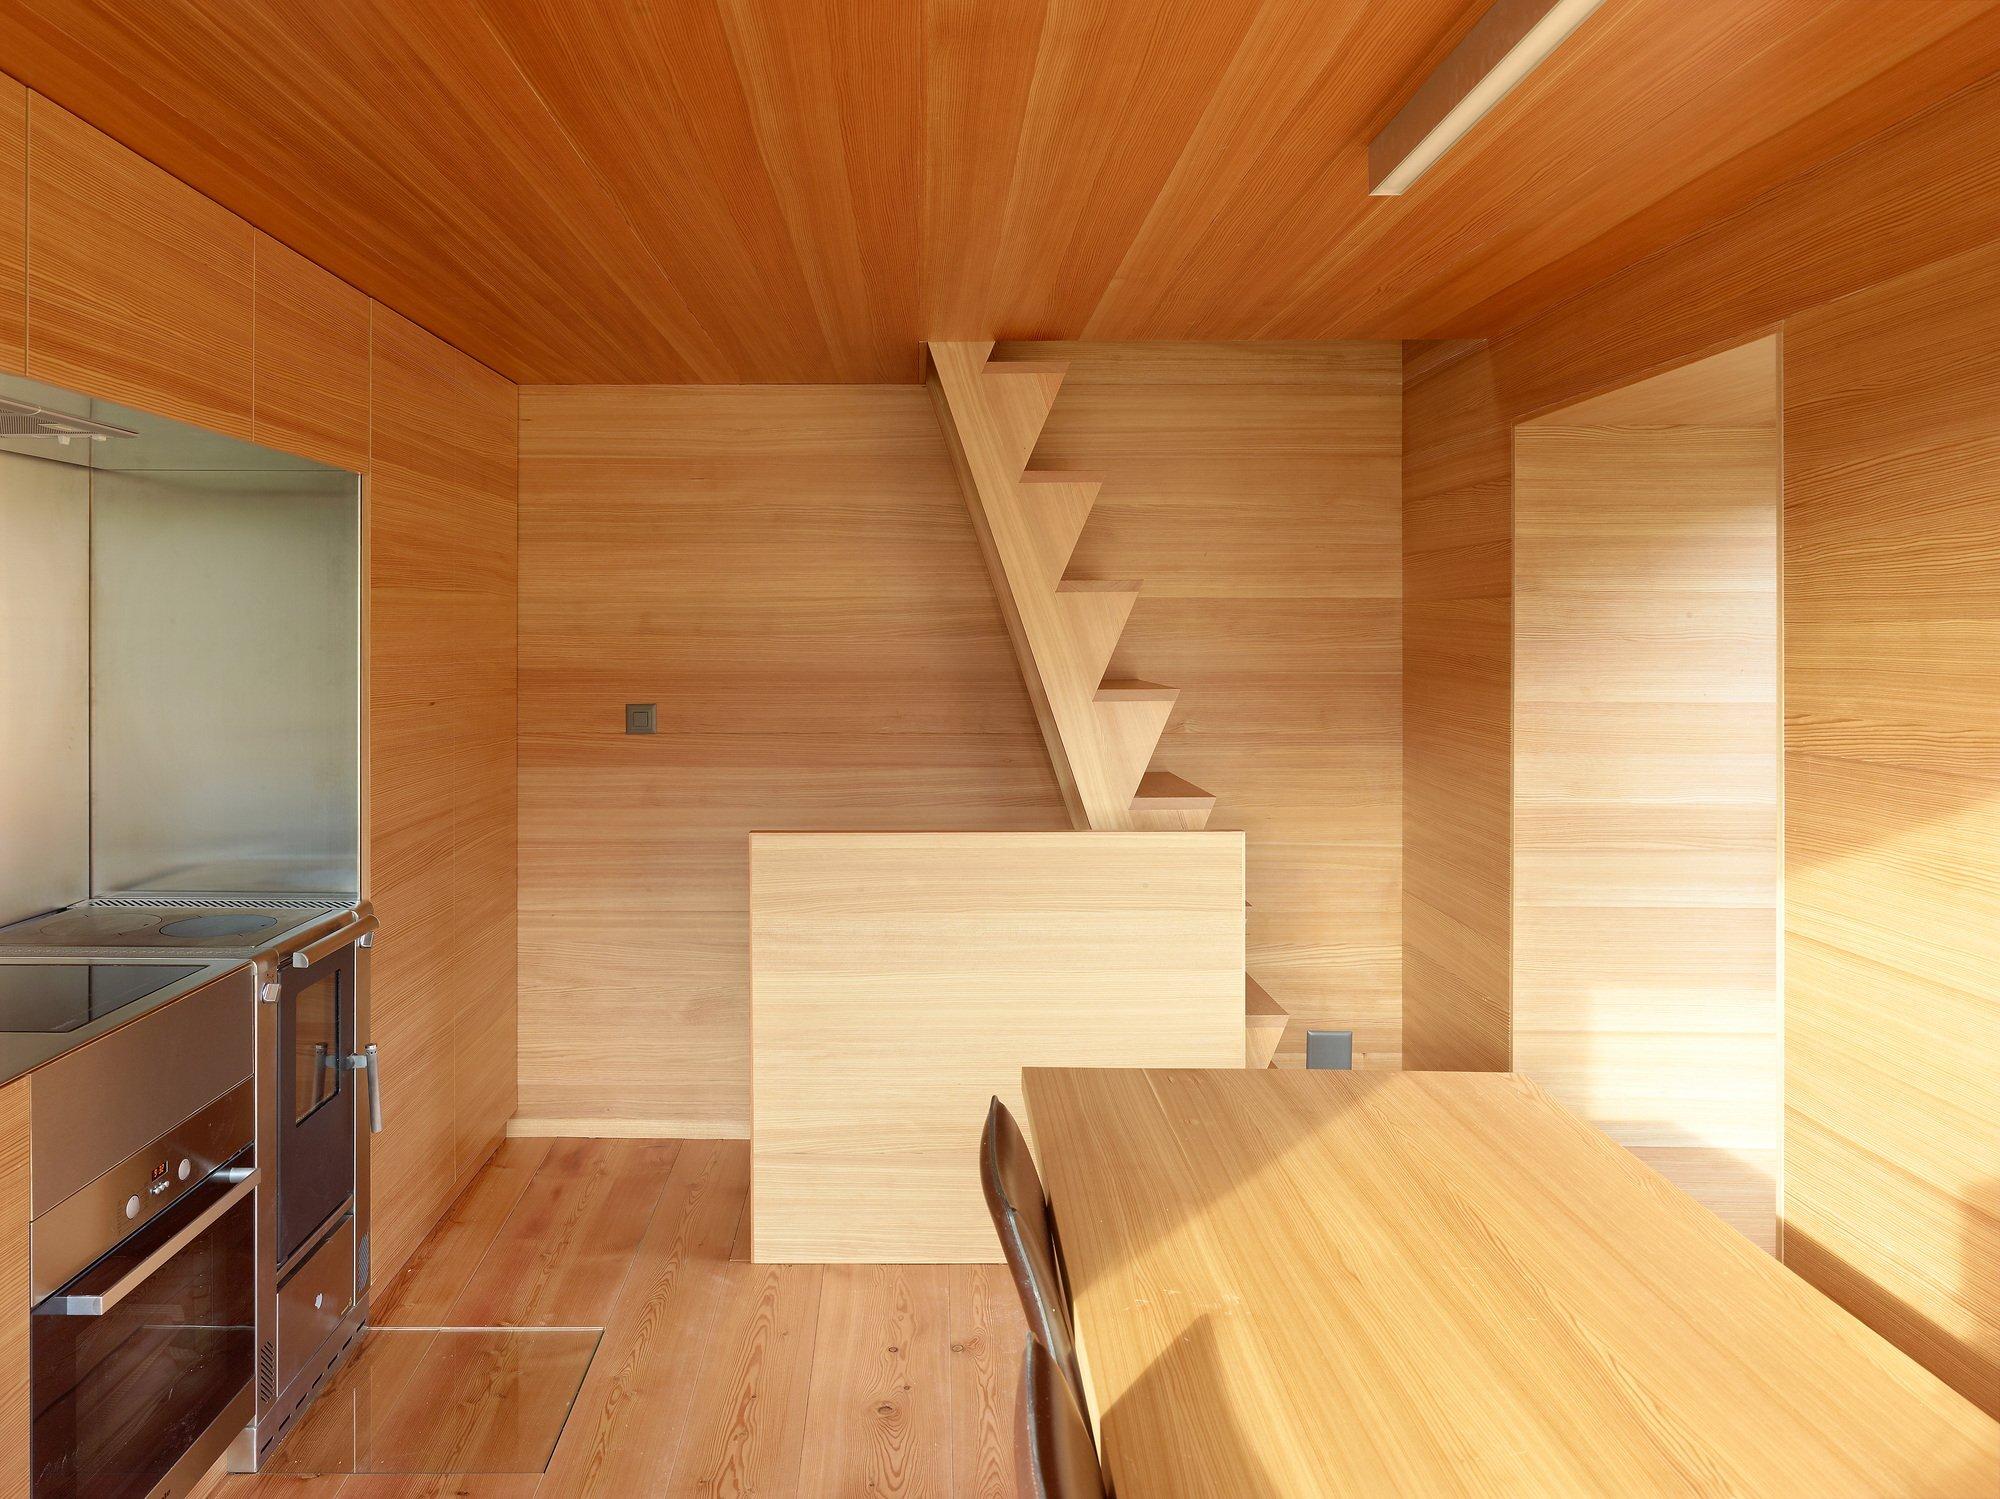 Boisset House in Switzerland by Savioz Fabrizzi Architectes - Kitchen - Humble Homes